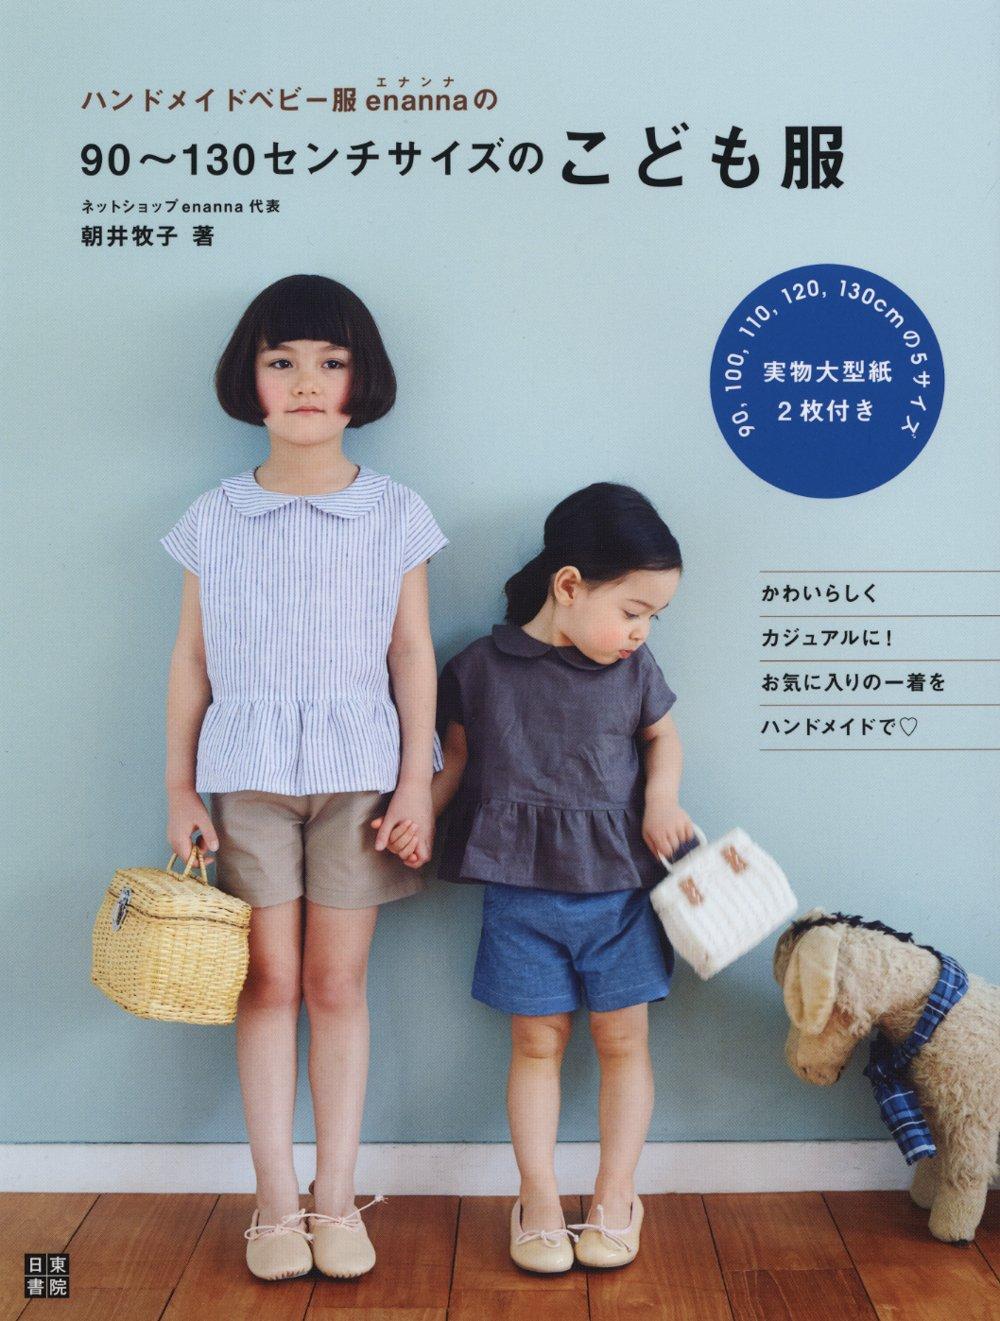 Handmade baby clothes enanna